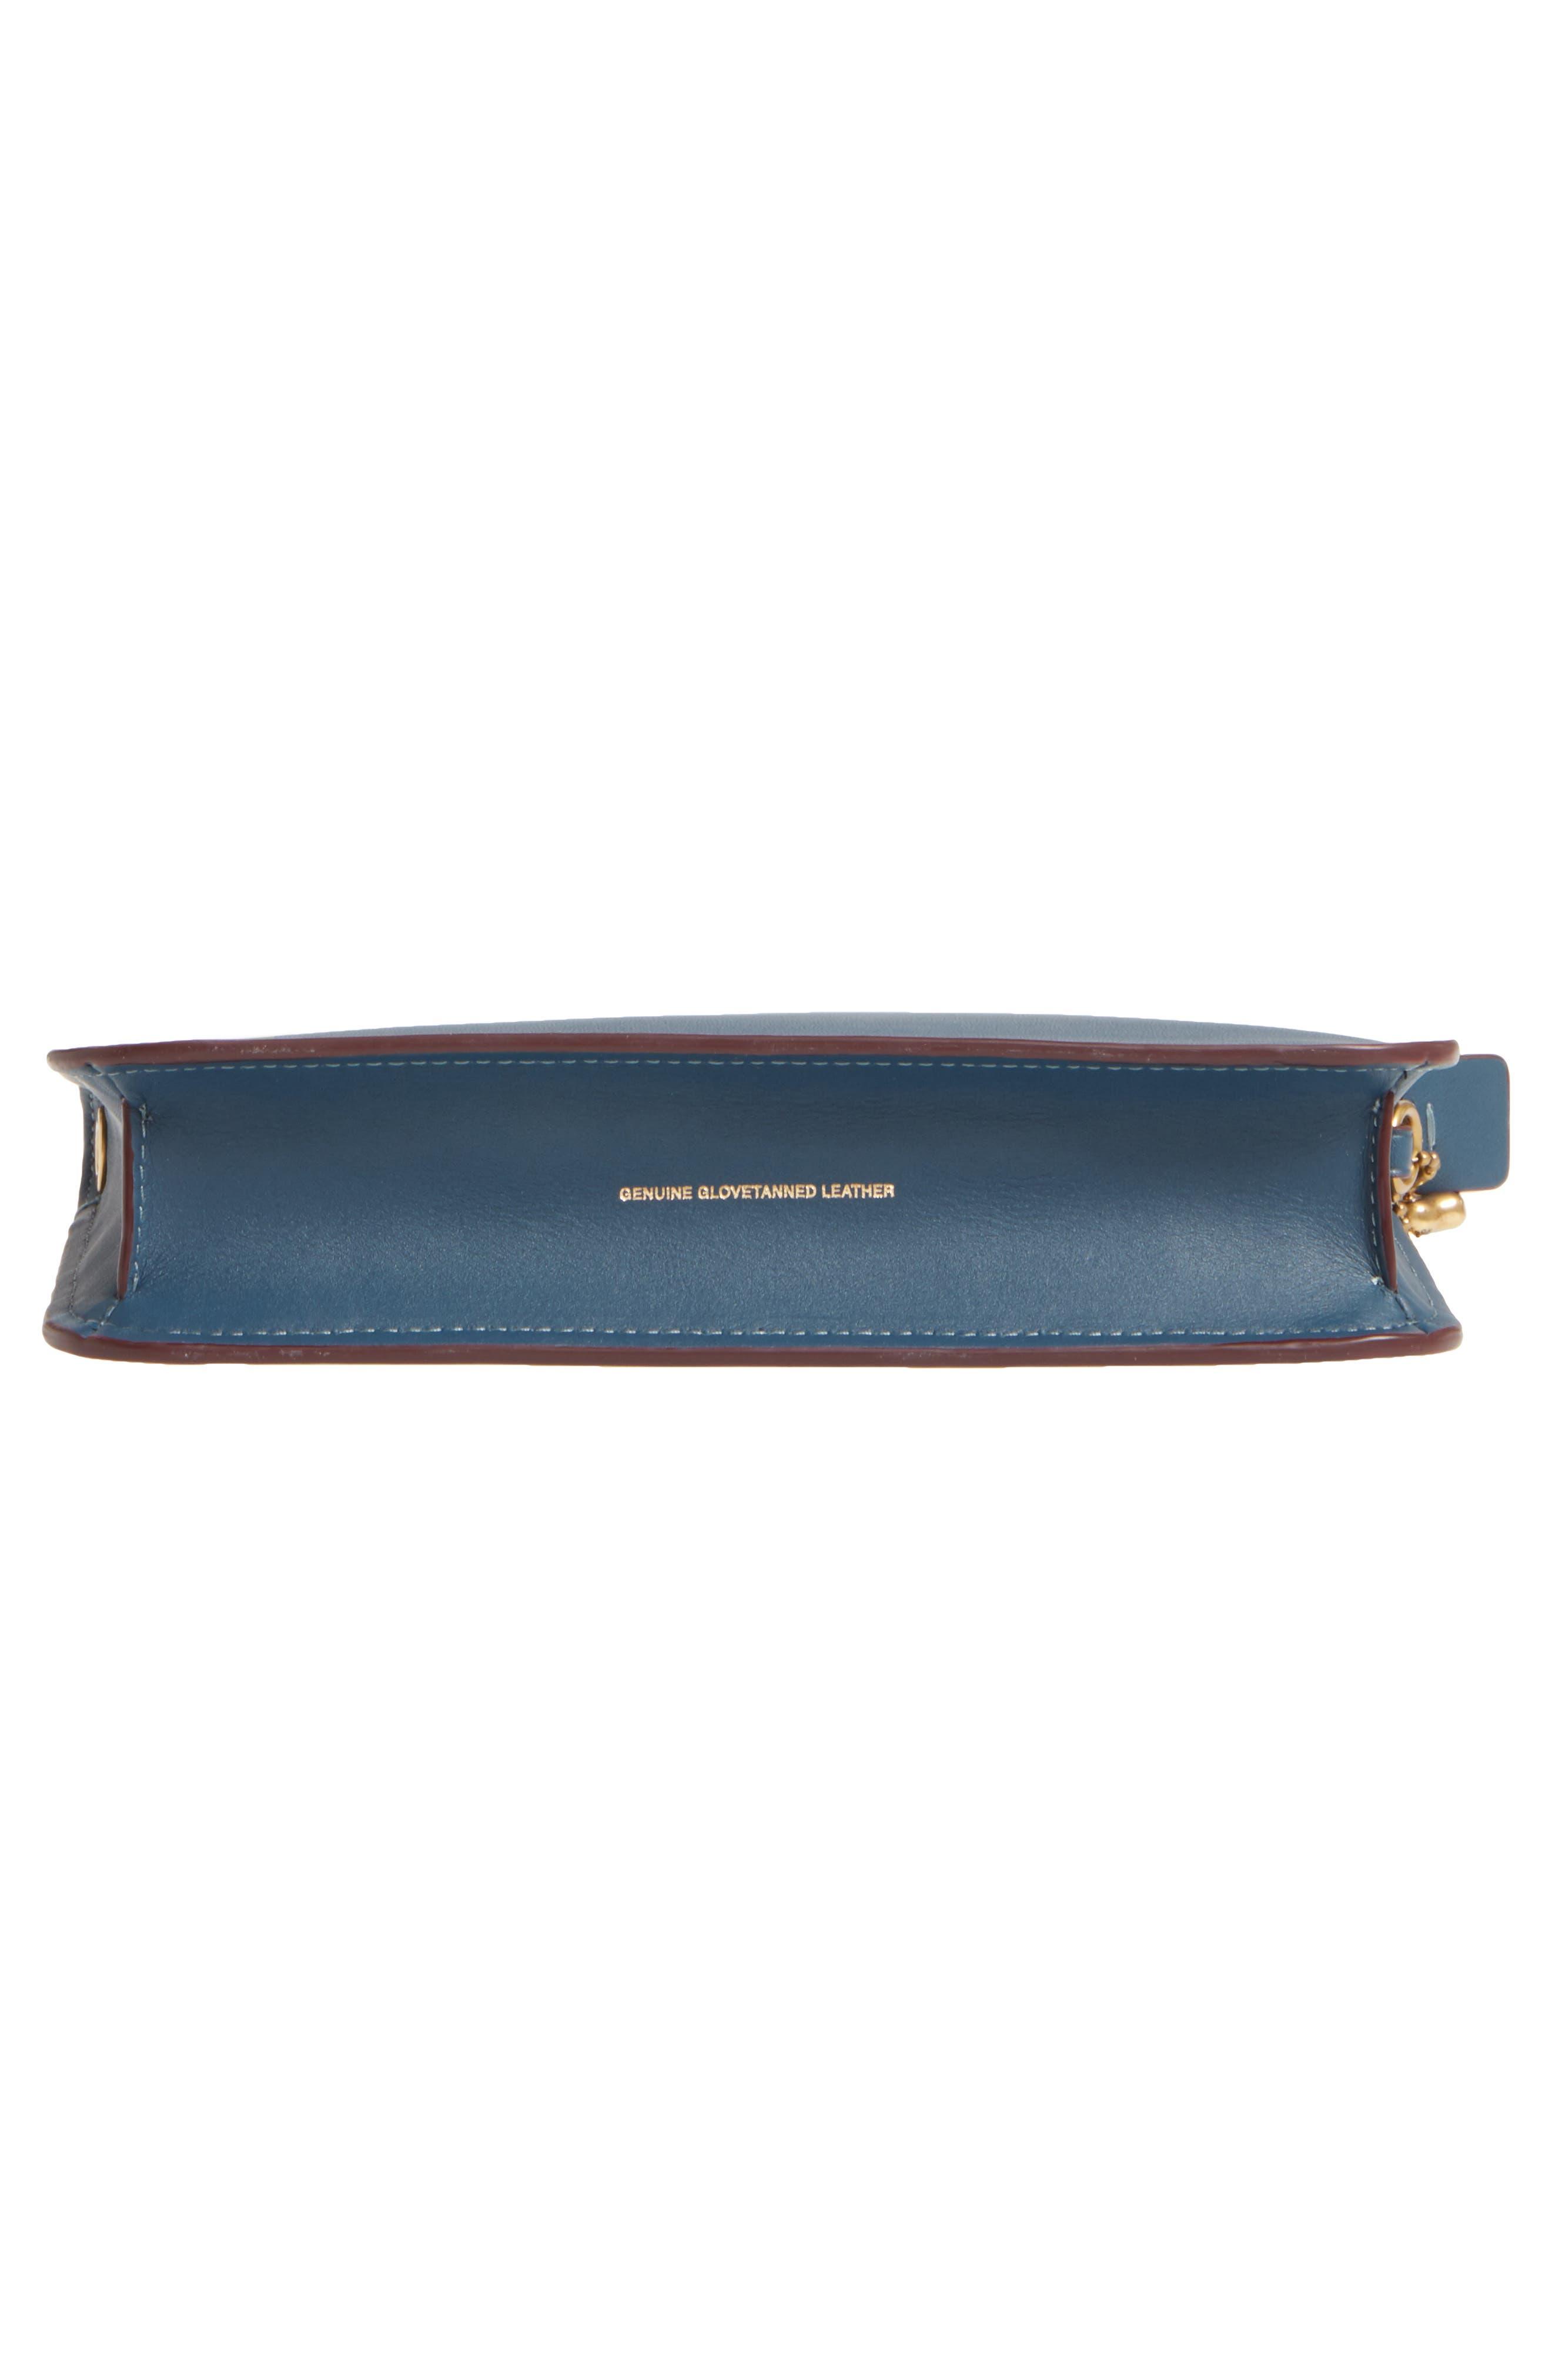 Soho Leather Crossbody Bag,                             Alternate thumbnail 6, color,